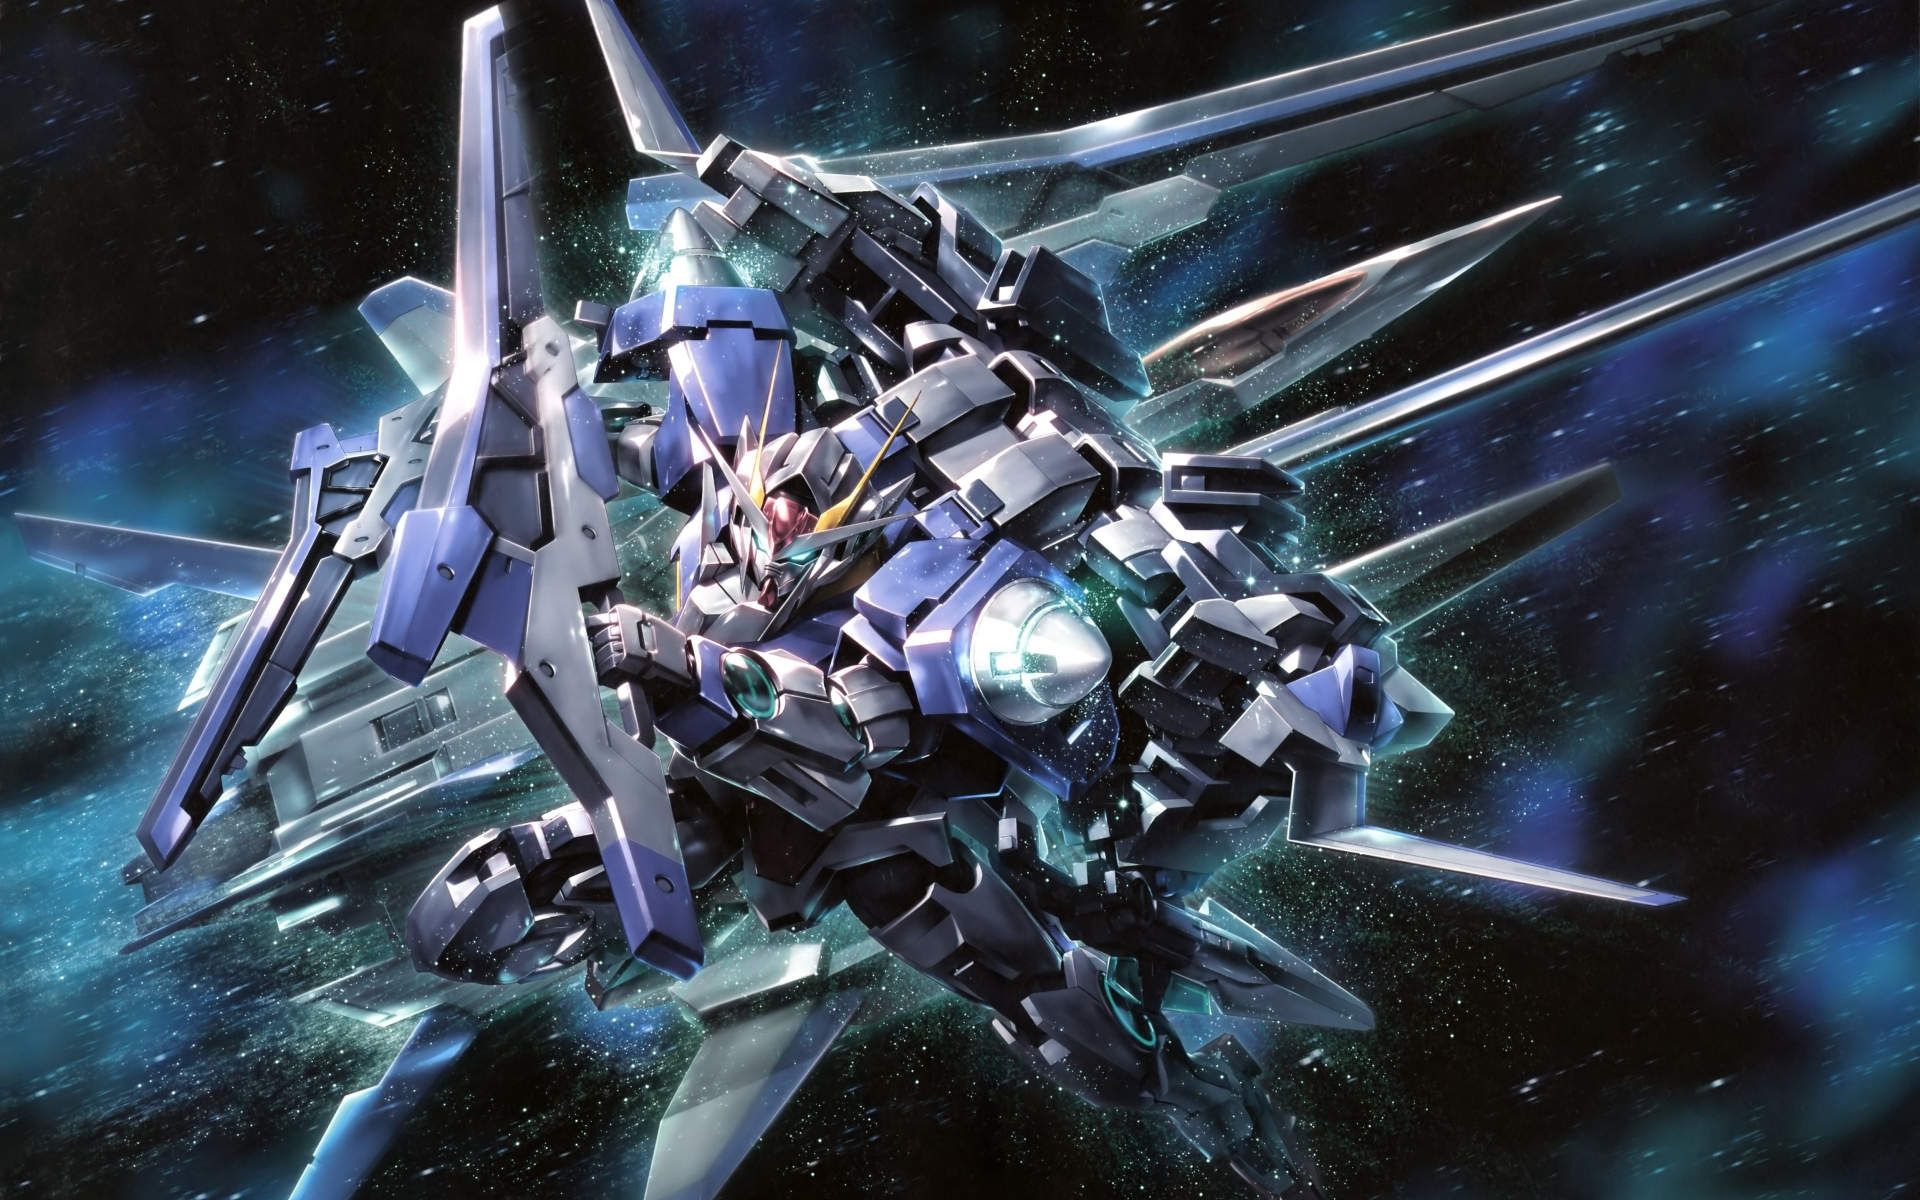 Gundam Deathscythe Wallpapers Photo at Movies Monodomo 1920x1200